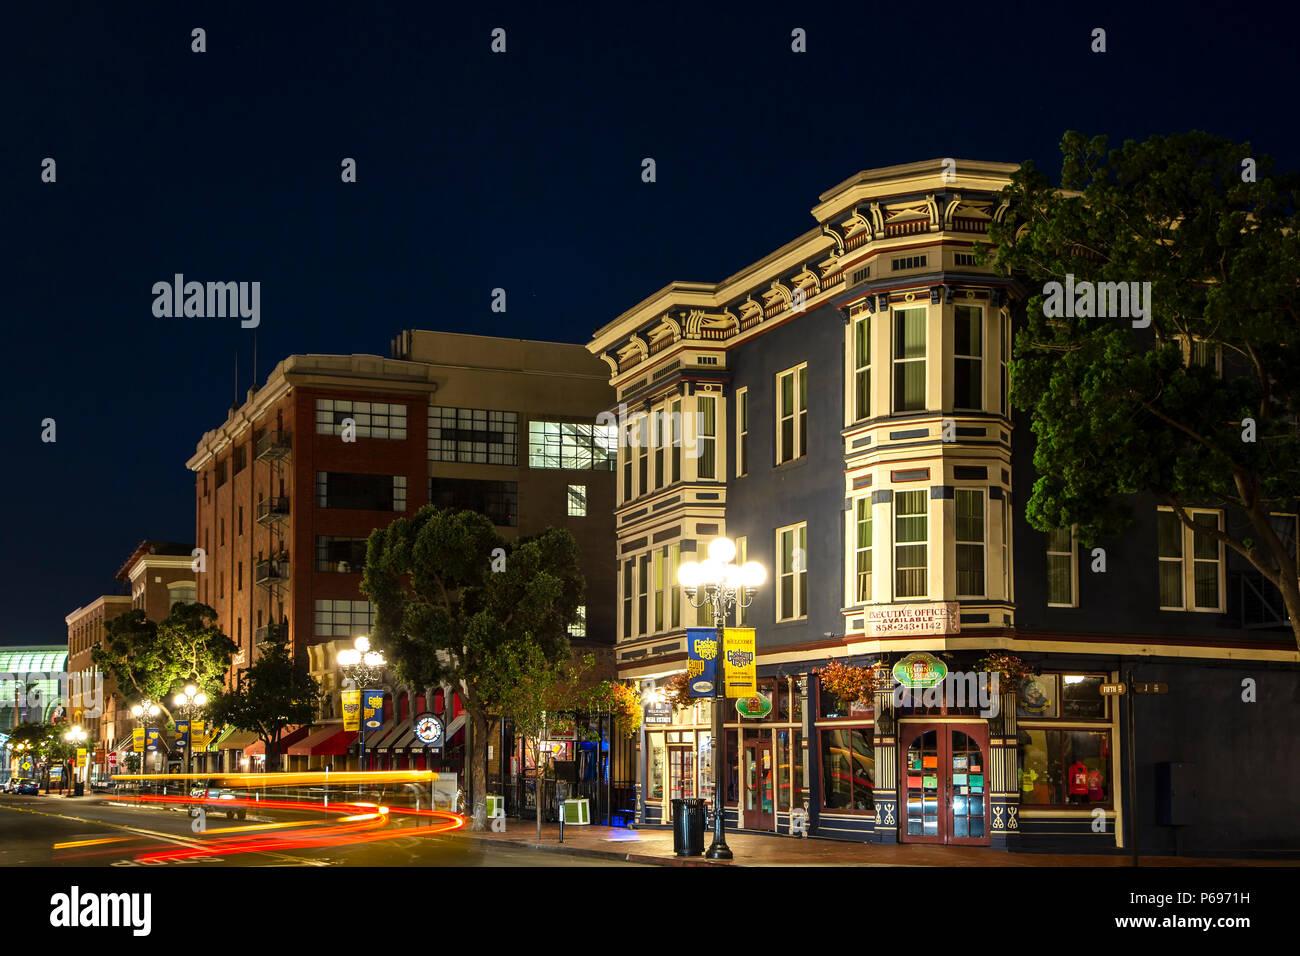 Historic Gaslamp Quarter, San Diego, California USA - Stock Image